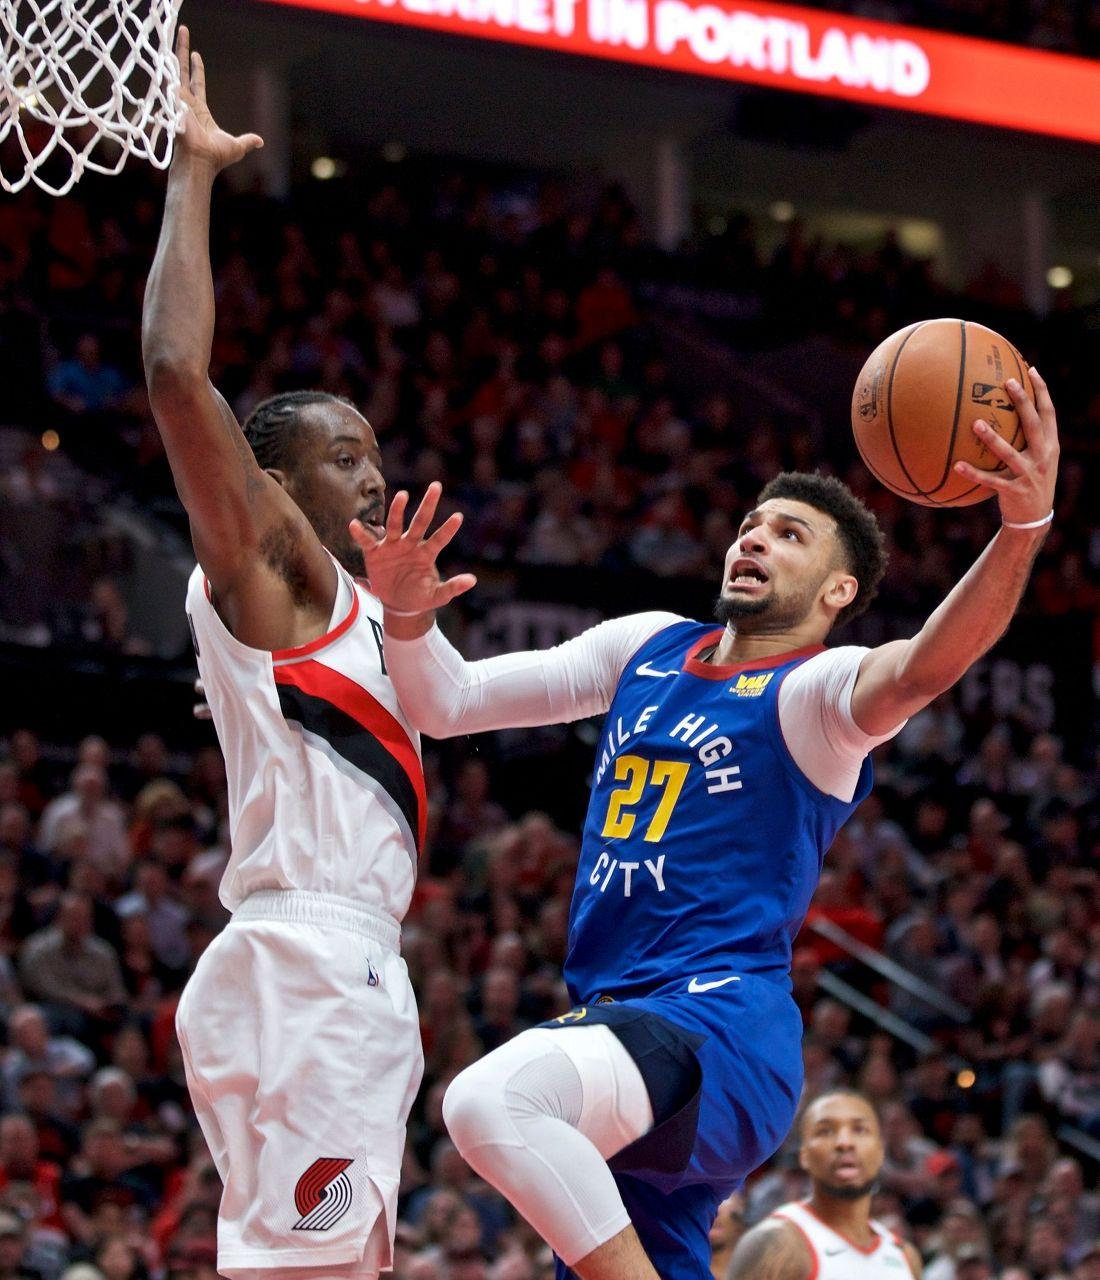 Portland Blazers 2019: Blazers Go Up 2-1 After 140-137 Win In 4 OTs Over Denver